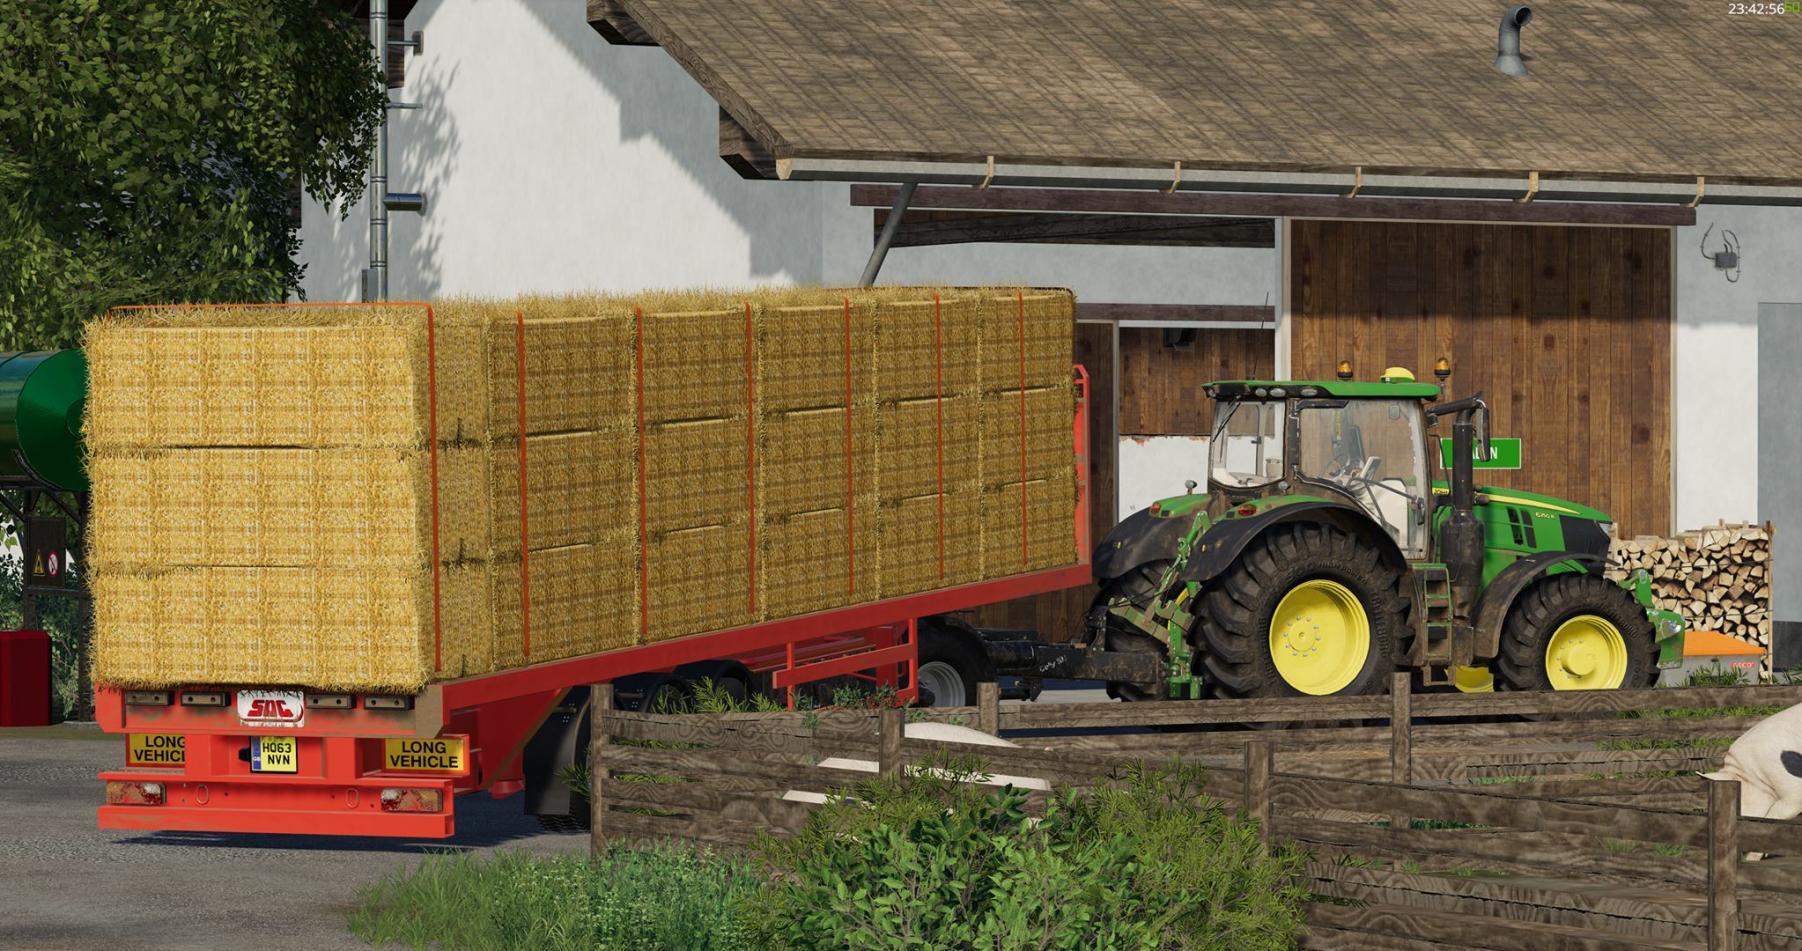 SDC Flatbed Trailer with Autoload V1 0 FS19 - Farming